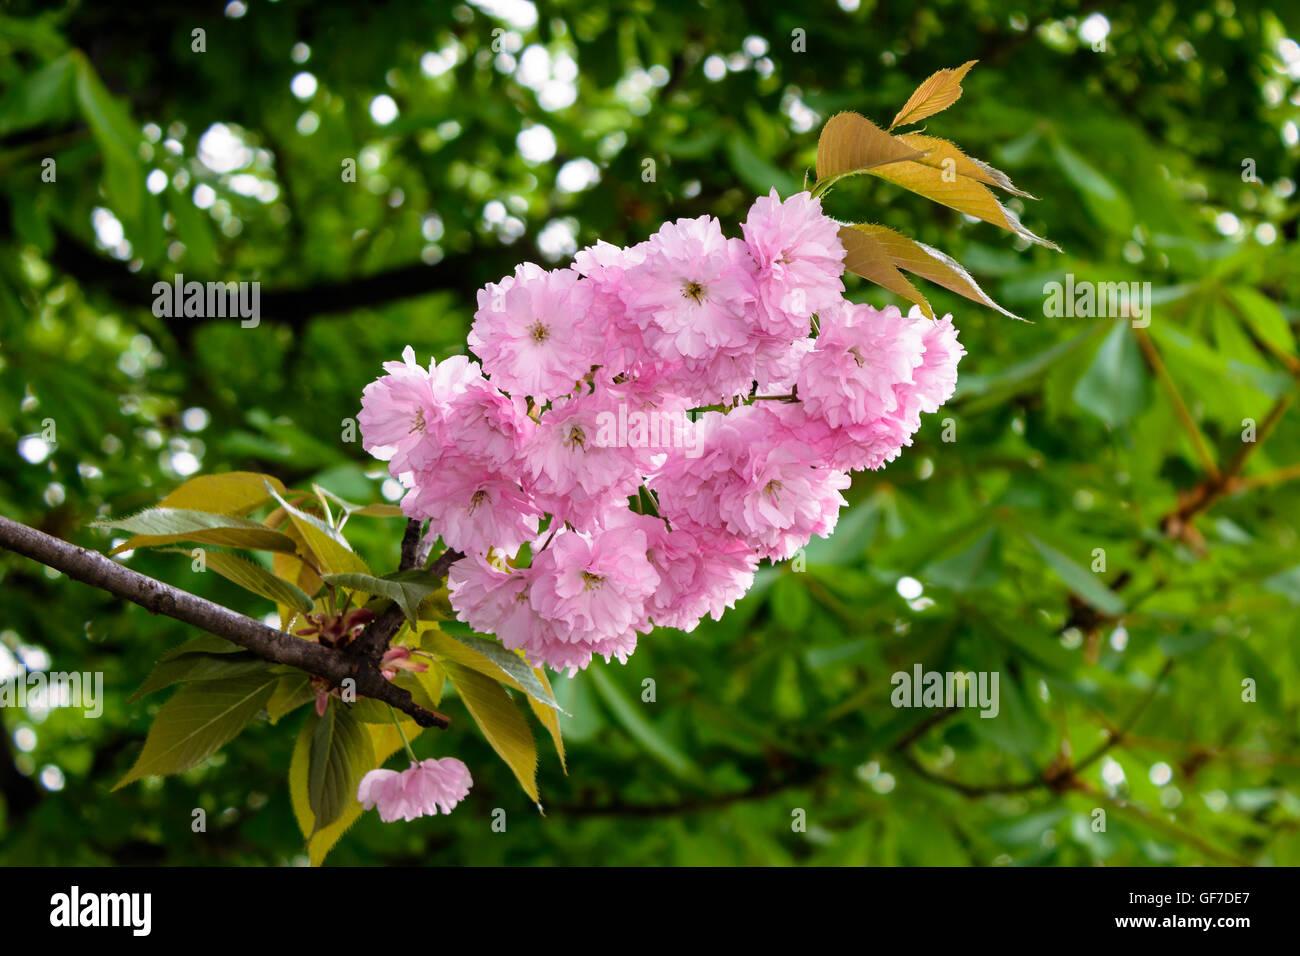 Delicate pink sakura flowers on a green tree crown stock photo delicate pink sakura flowers on a green tree crown dhlflorist Images